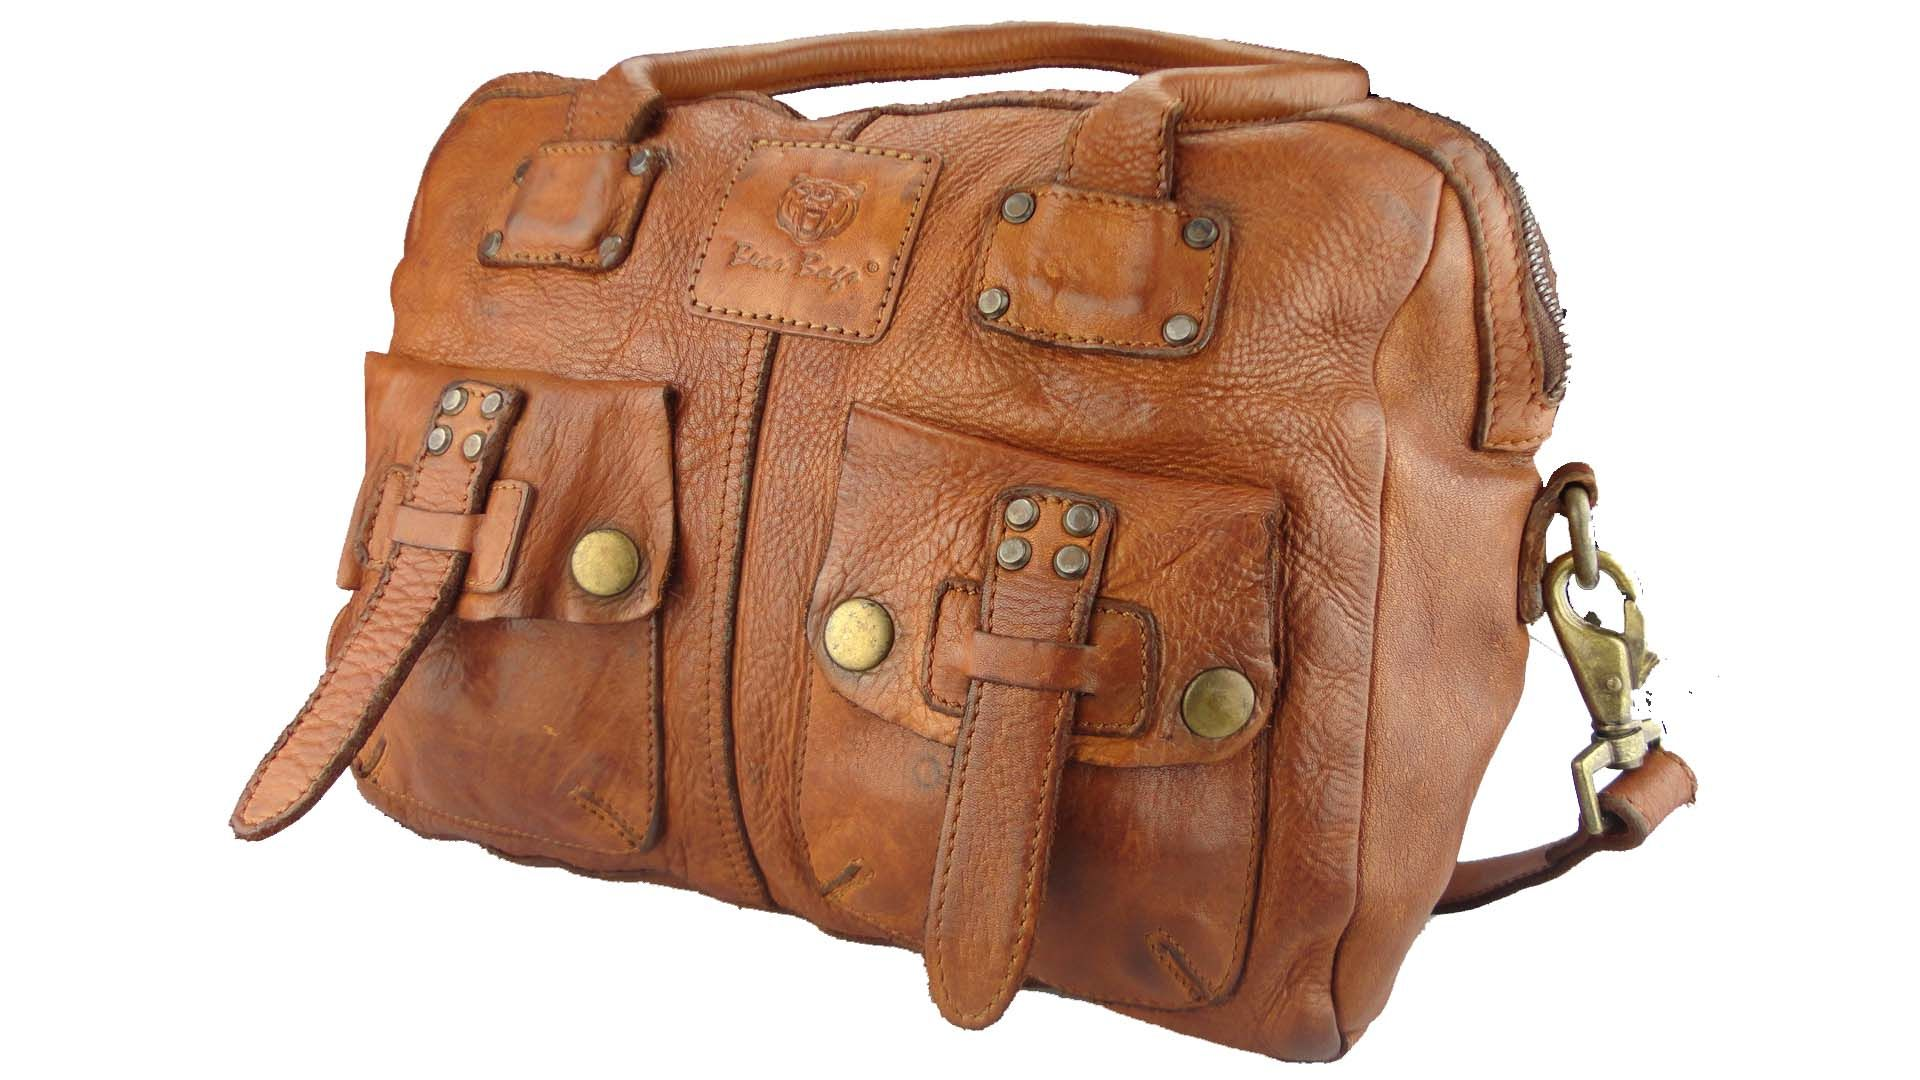 40d9b4570f2 Bear Design Grizzly Leren Handtas Schoudertas Gewassen Leder Cognac -  Barneys Leather